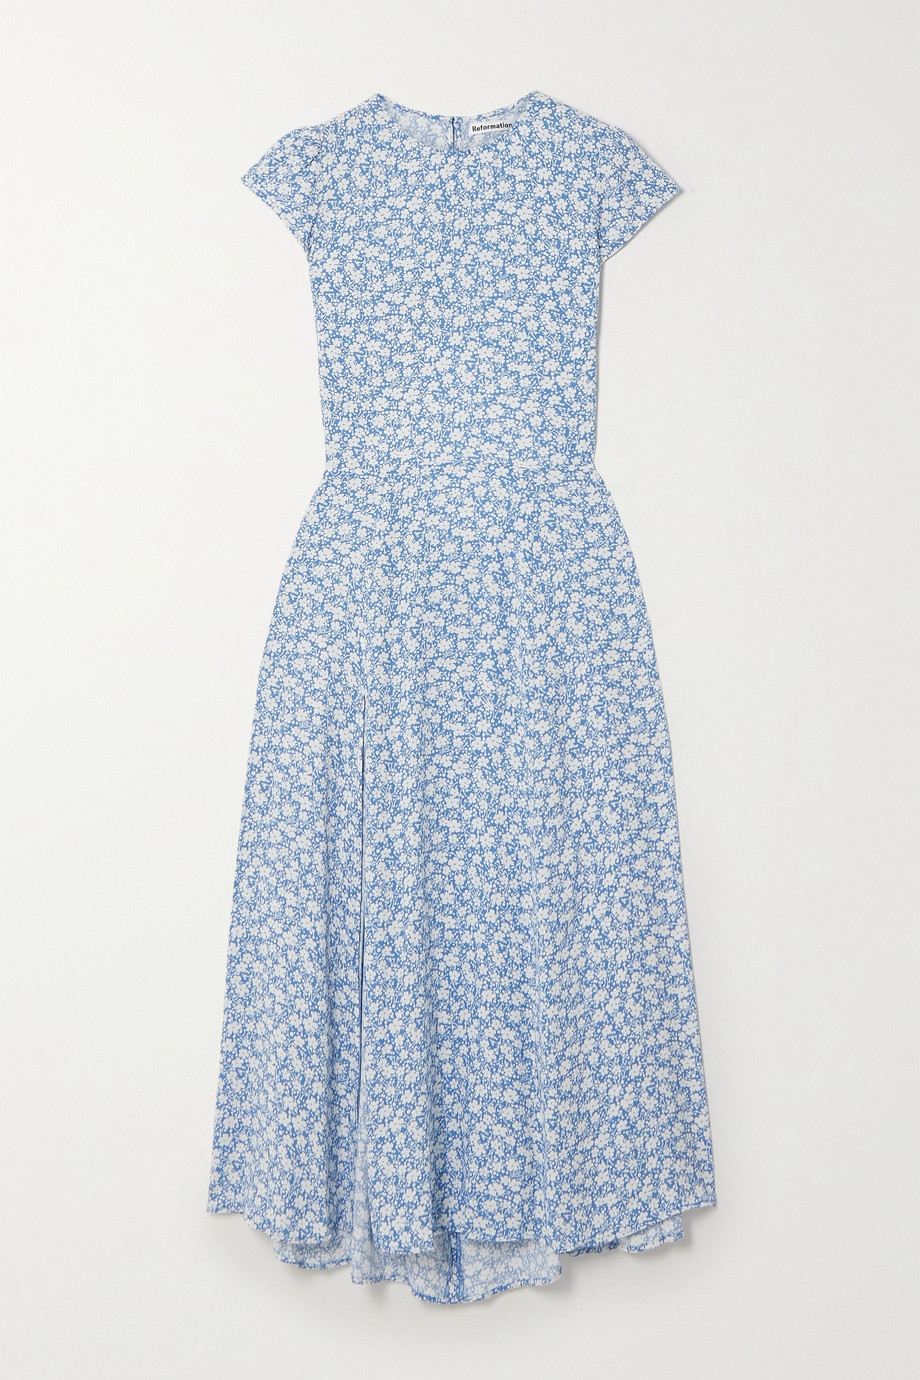 Reformation Gavin open-back floral-print crepe midi dress